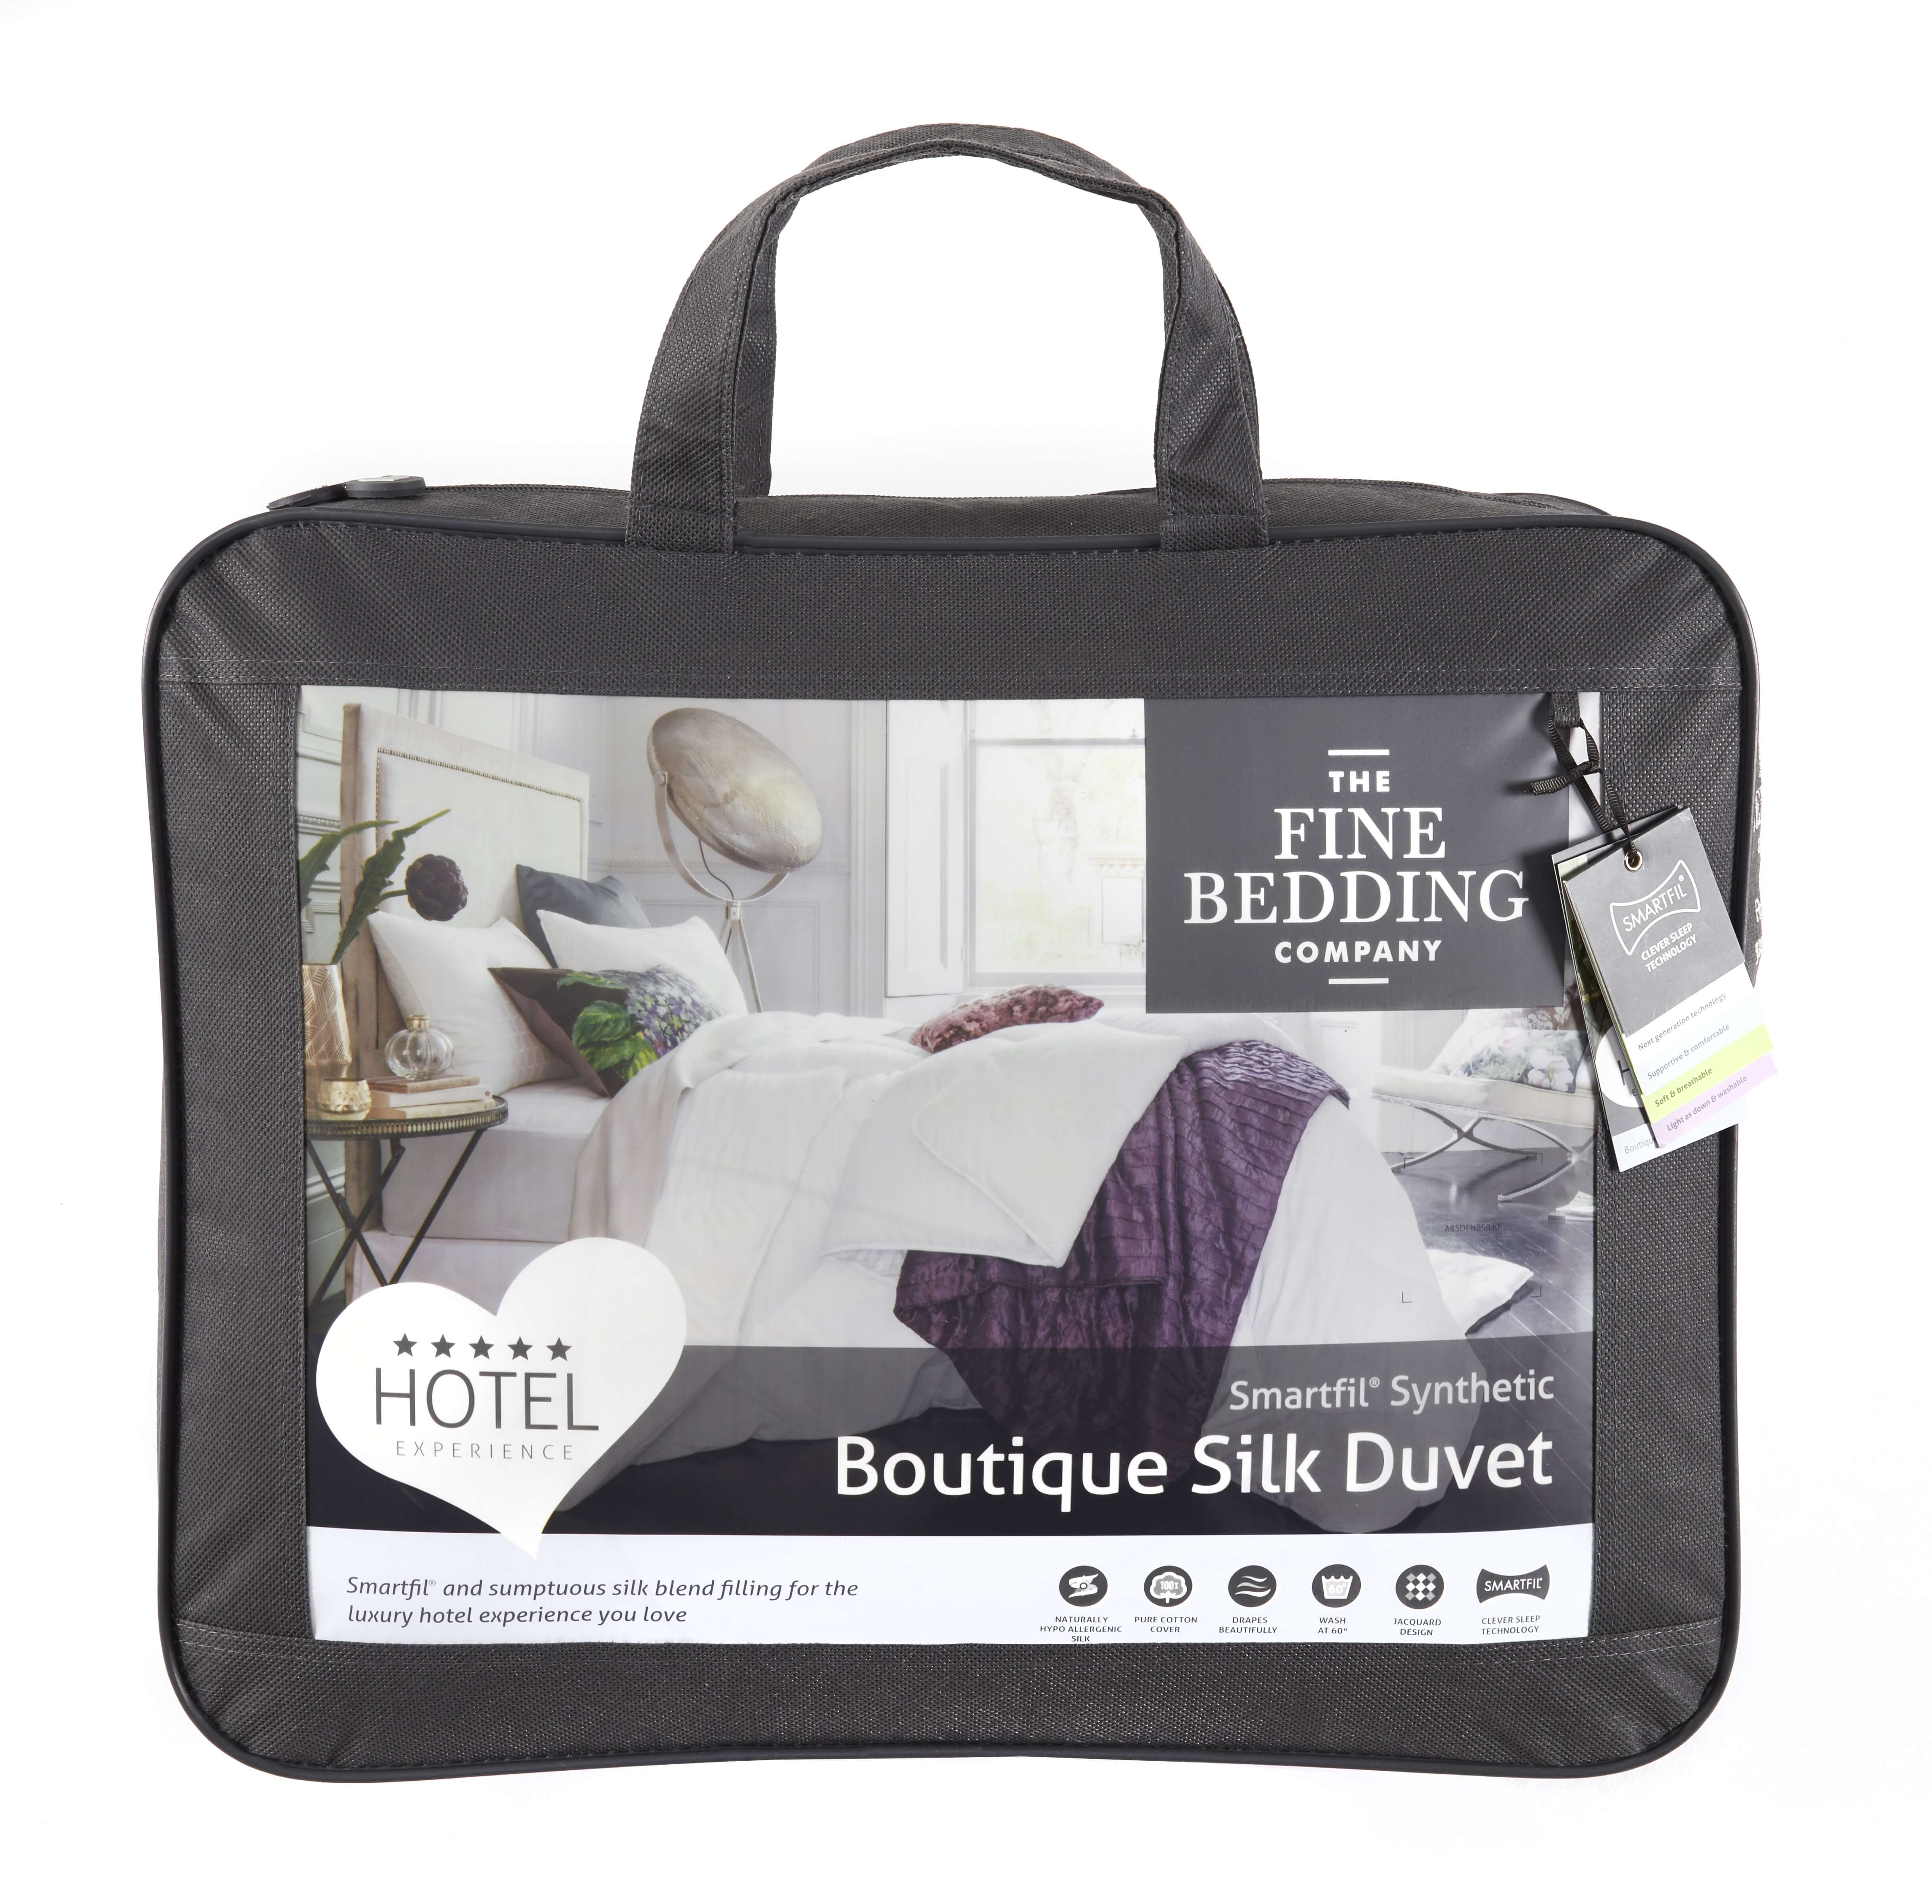 Boutique Silk Duvet -The Fine Bedding Company